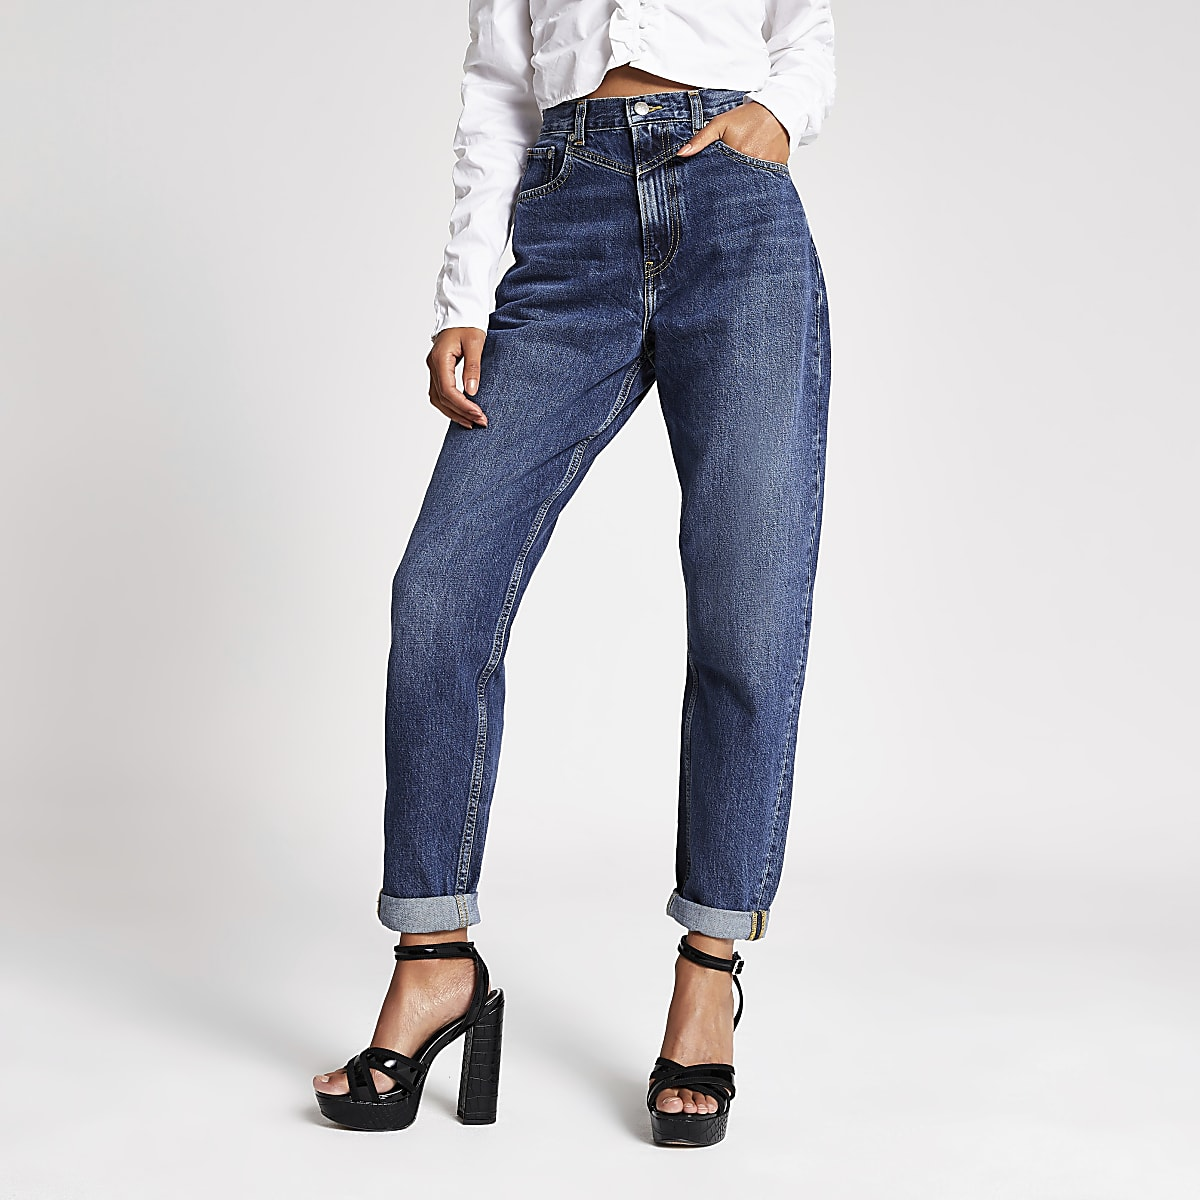 Dua Lipa x Pepe Jeans blue denim jeans